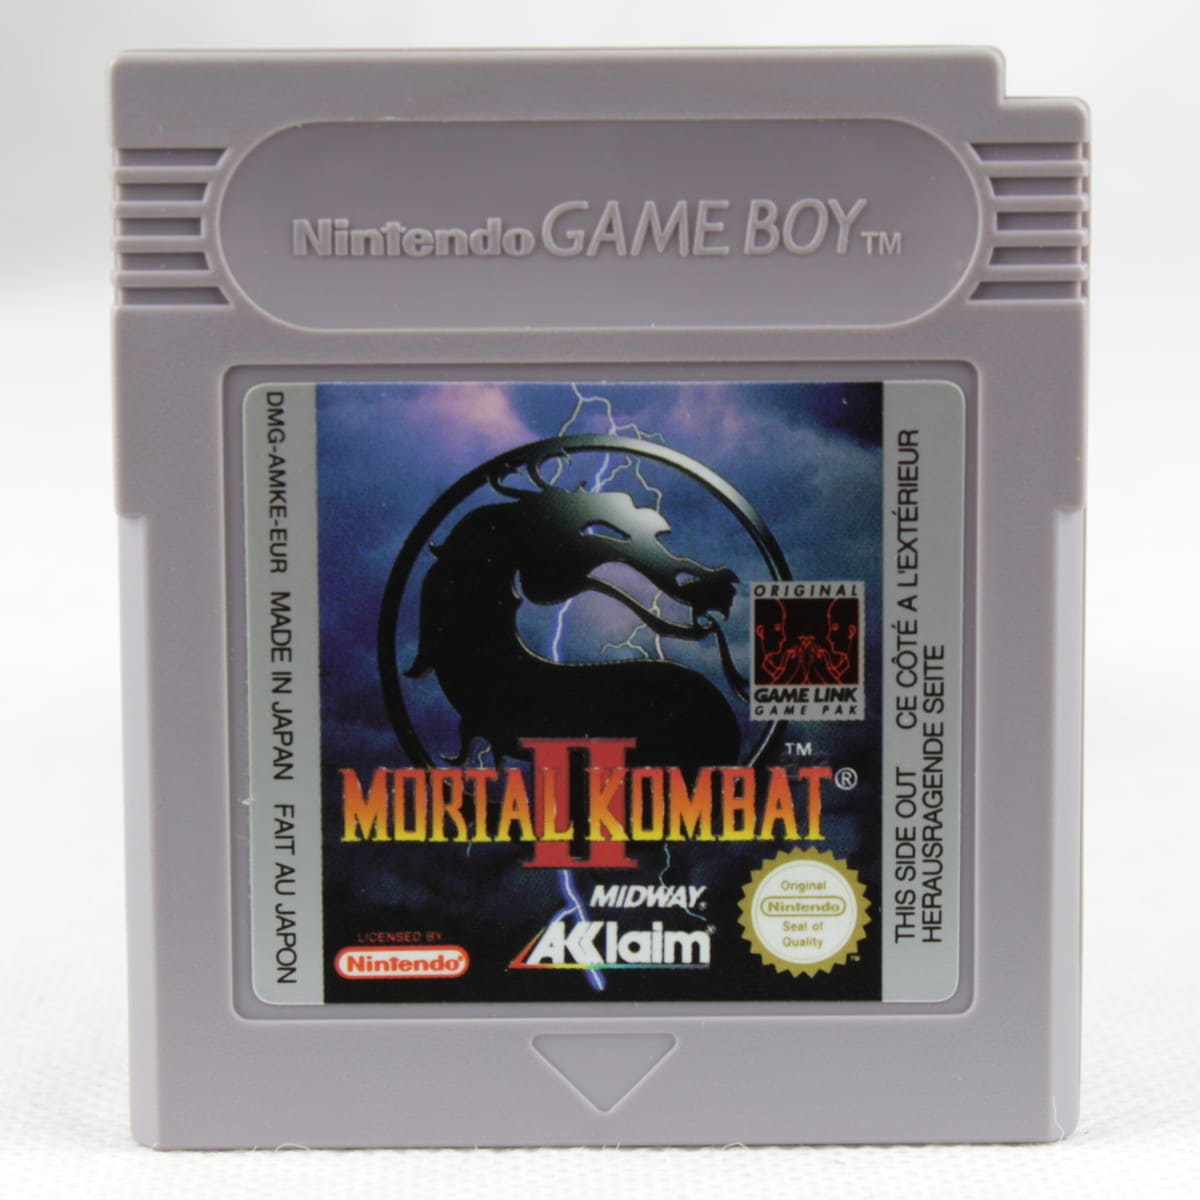 Mortal Kombat II (Game Boy)